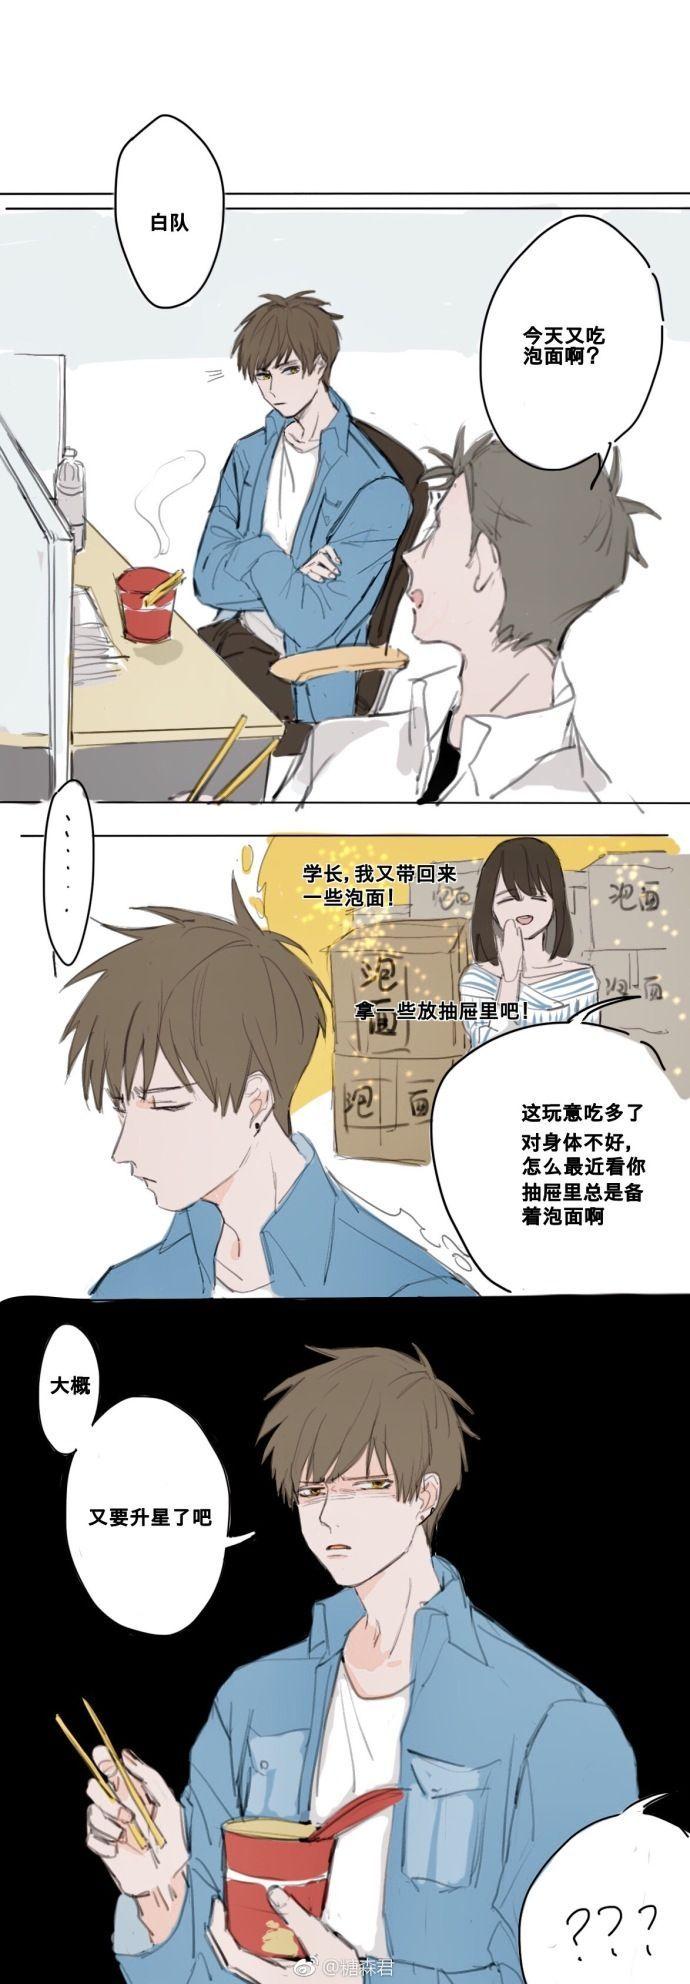 Pin By Meen Sukanya On Baiqi 백기 ハク 白起 7 29 Handsome Anime Anime Mr